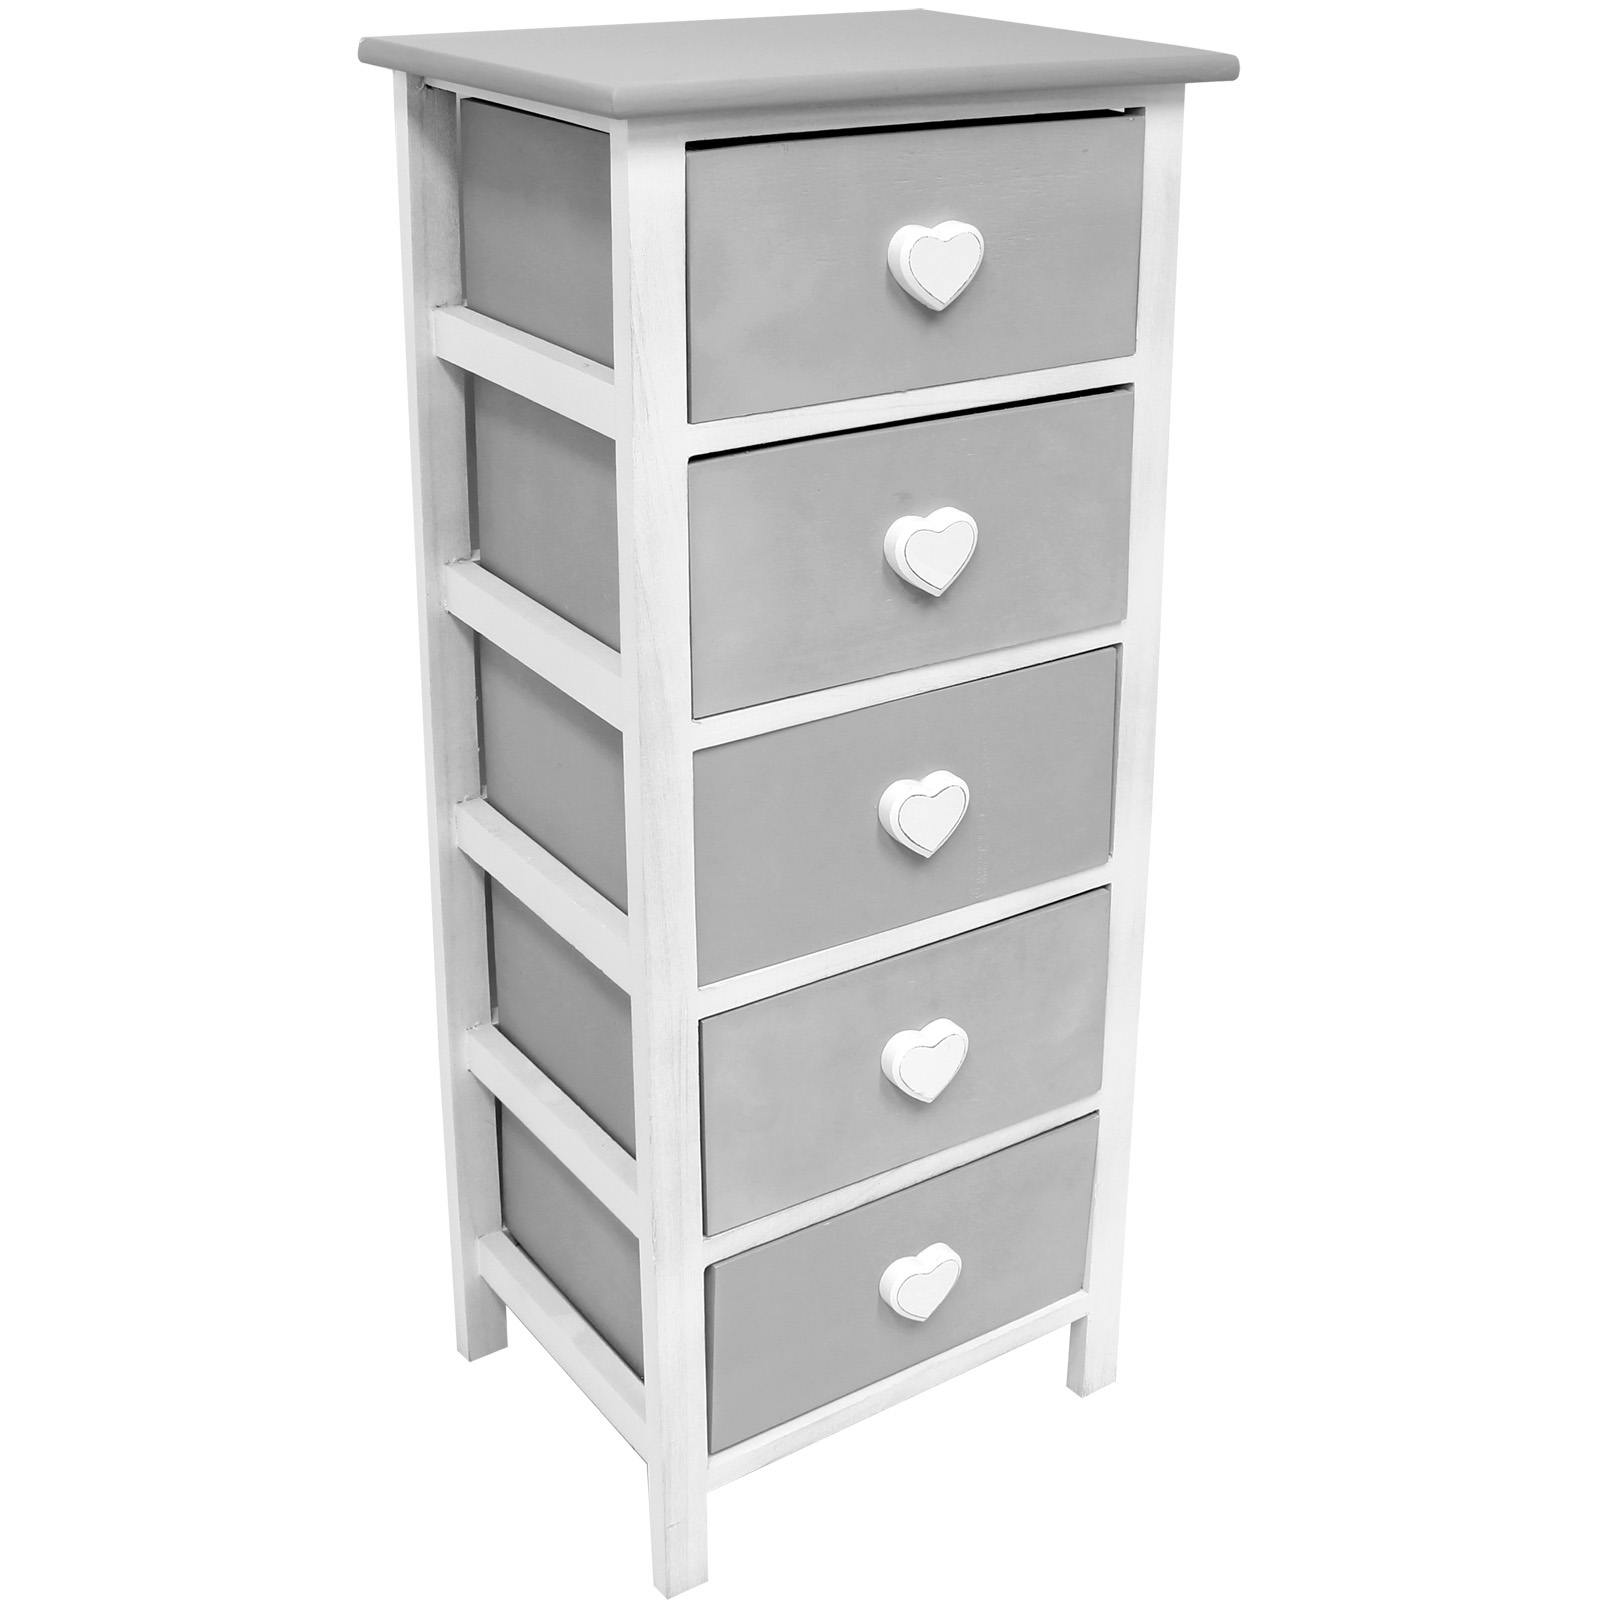 bed storage units item specifics arnoldsfurmainfinal item specifics bedroom chest drawers cabinet : white storage unit wicker